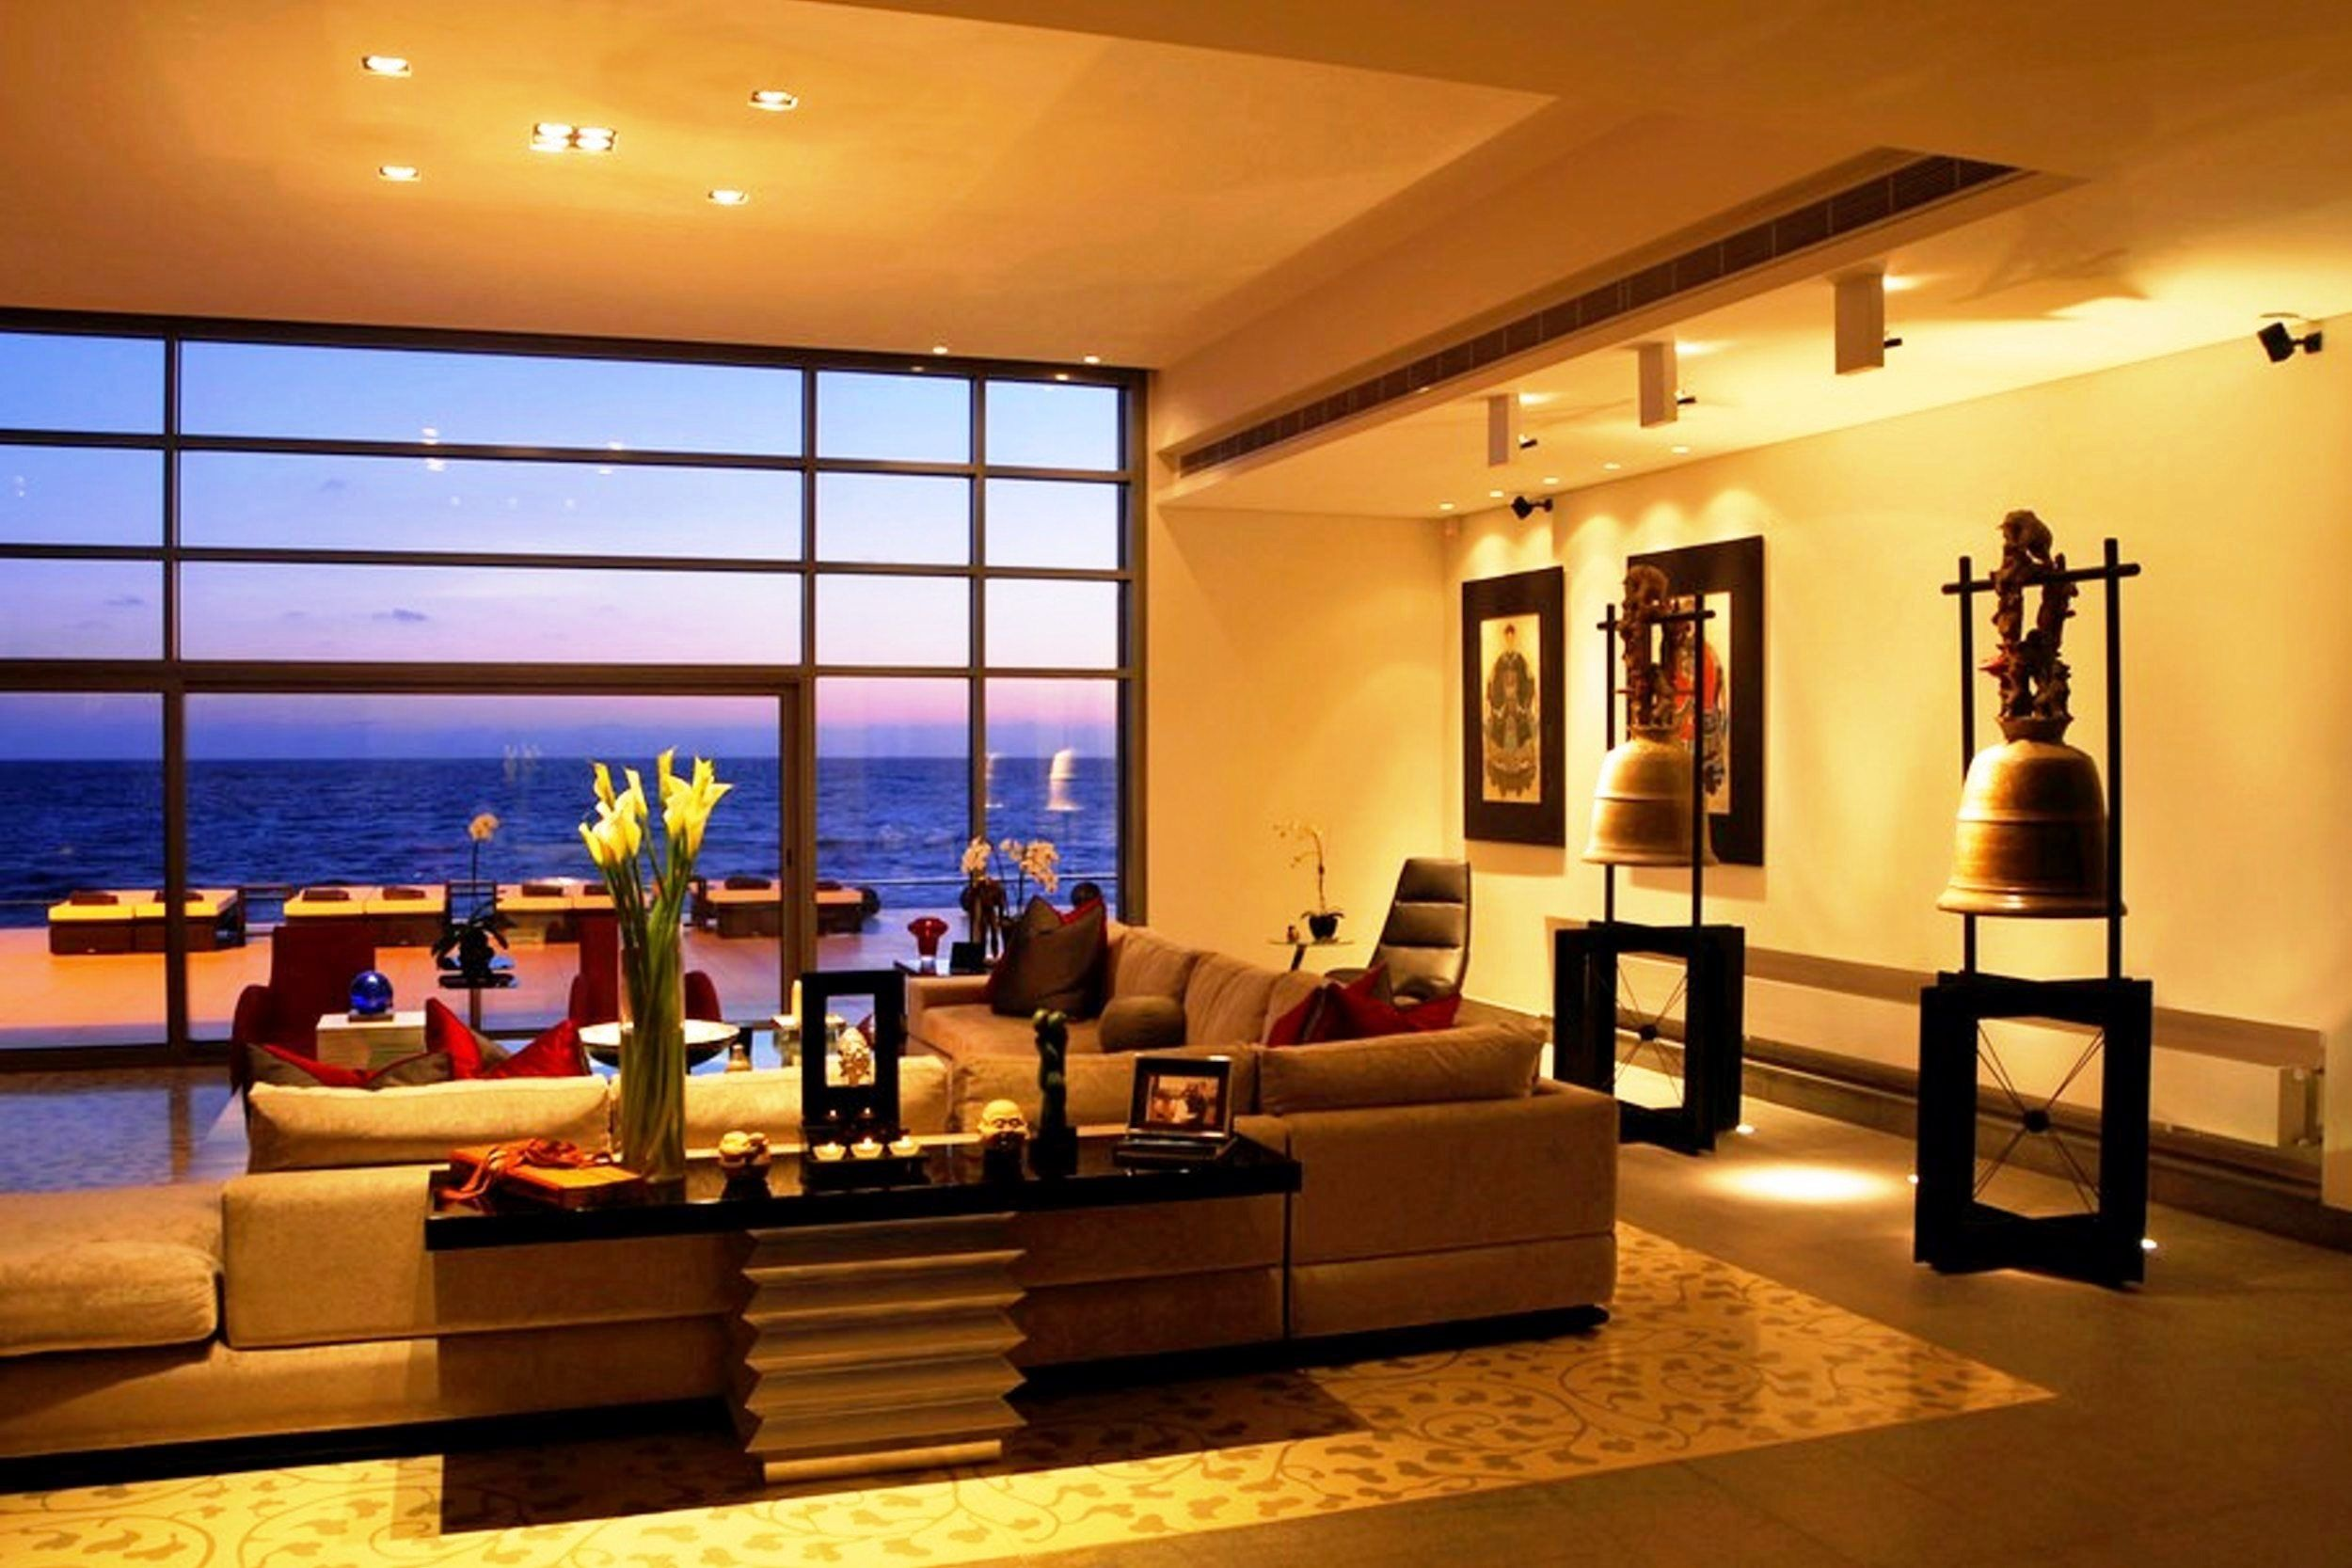 Asian interior decorating modern asian interior design style